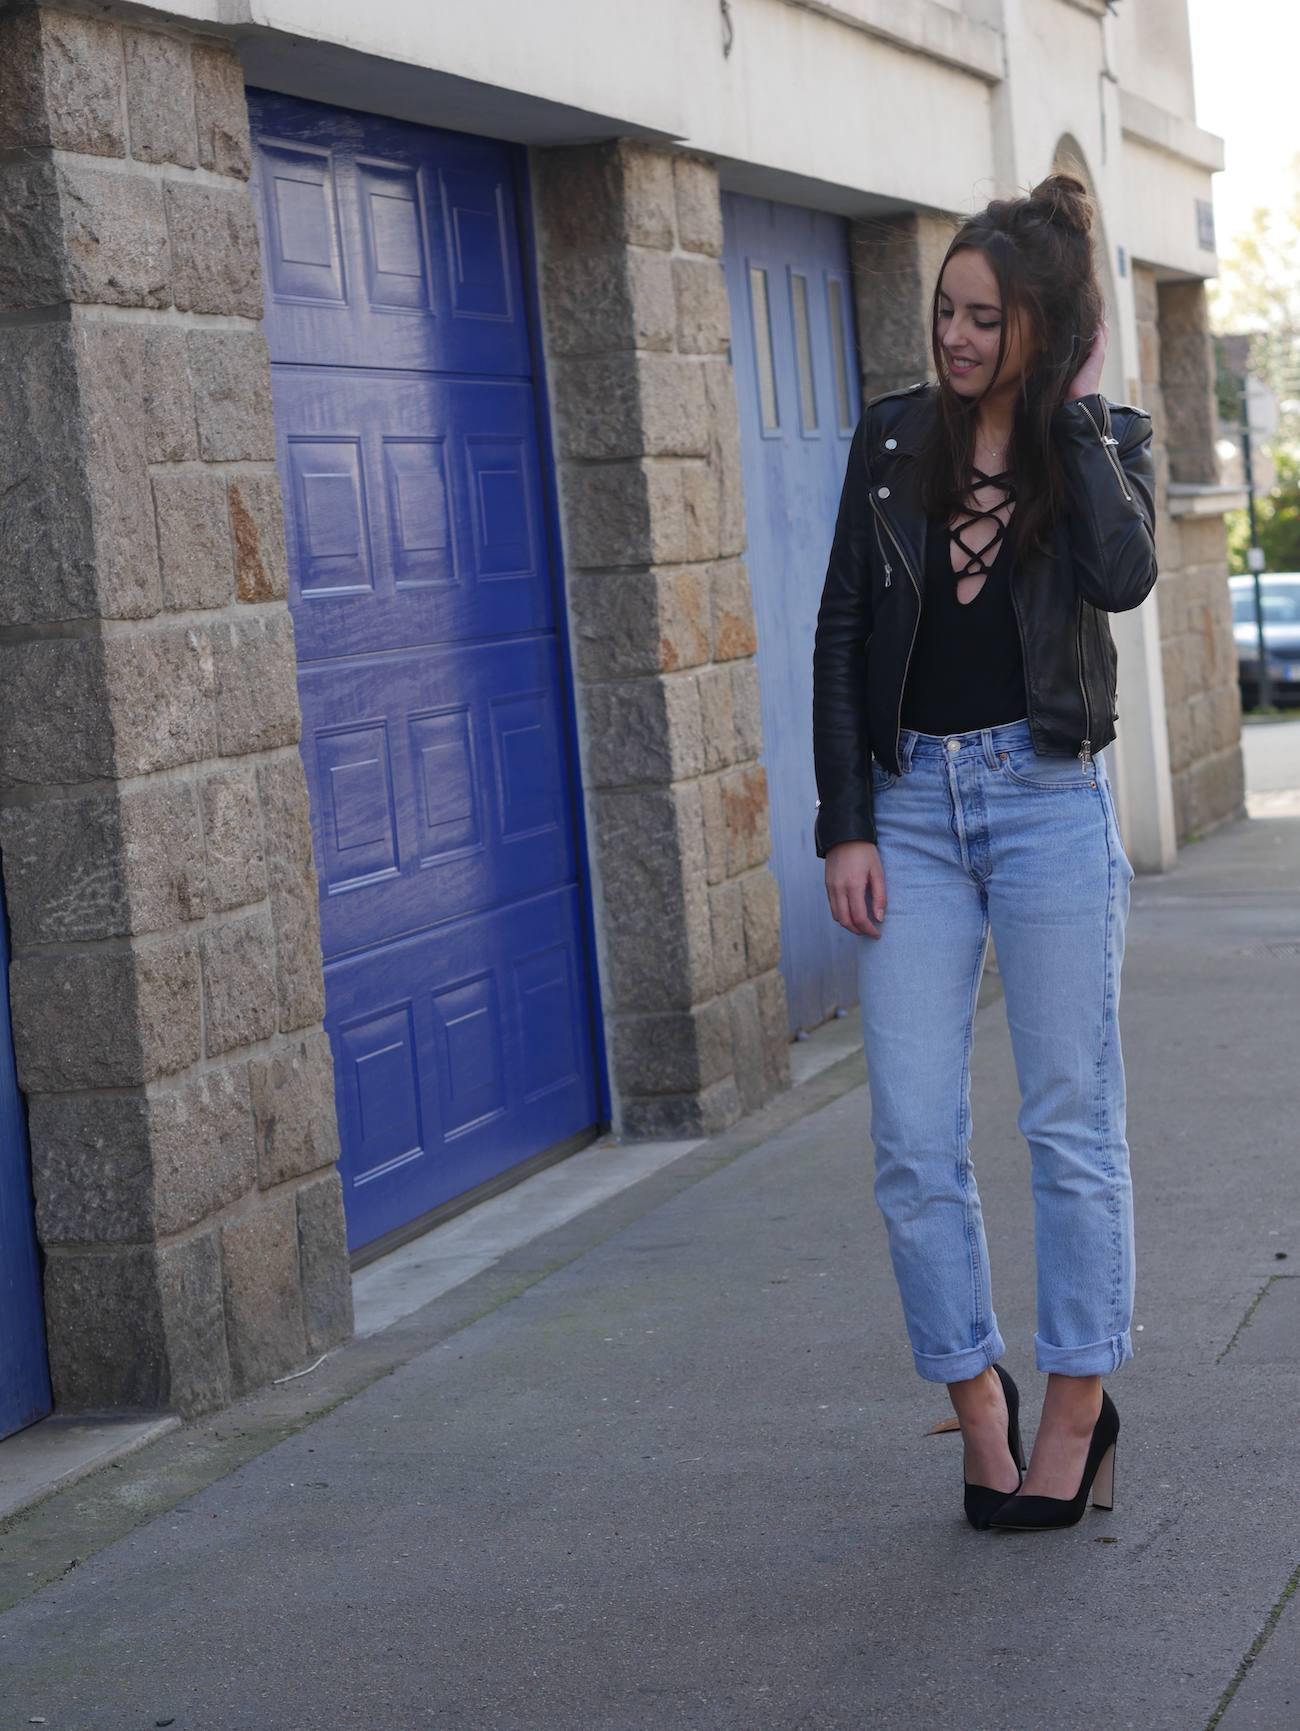 blog nantes - nolwenn c 13